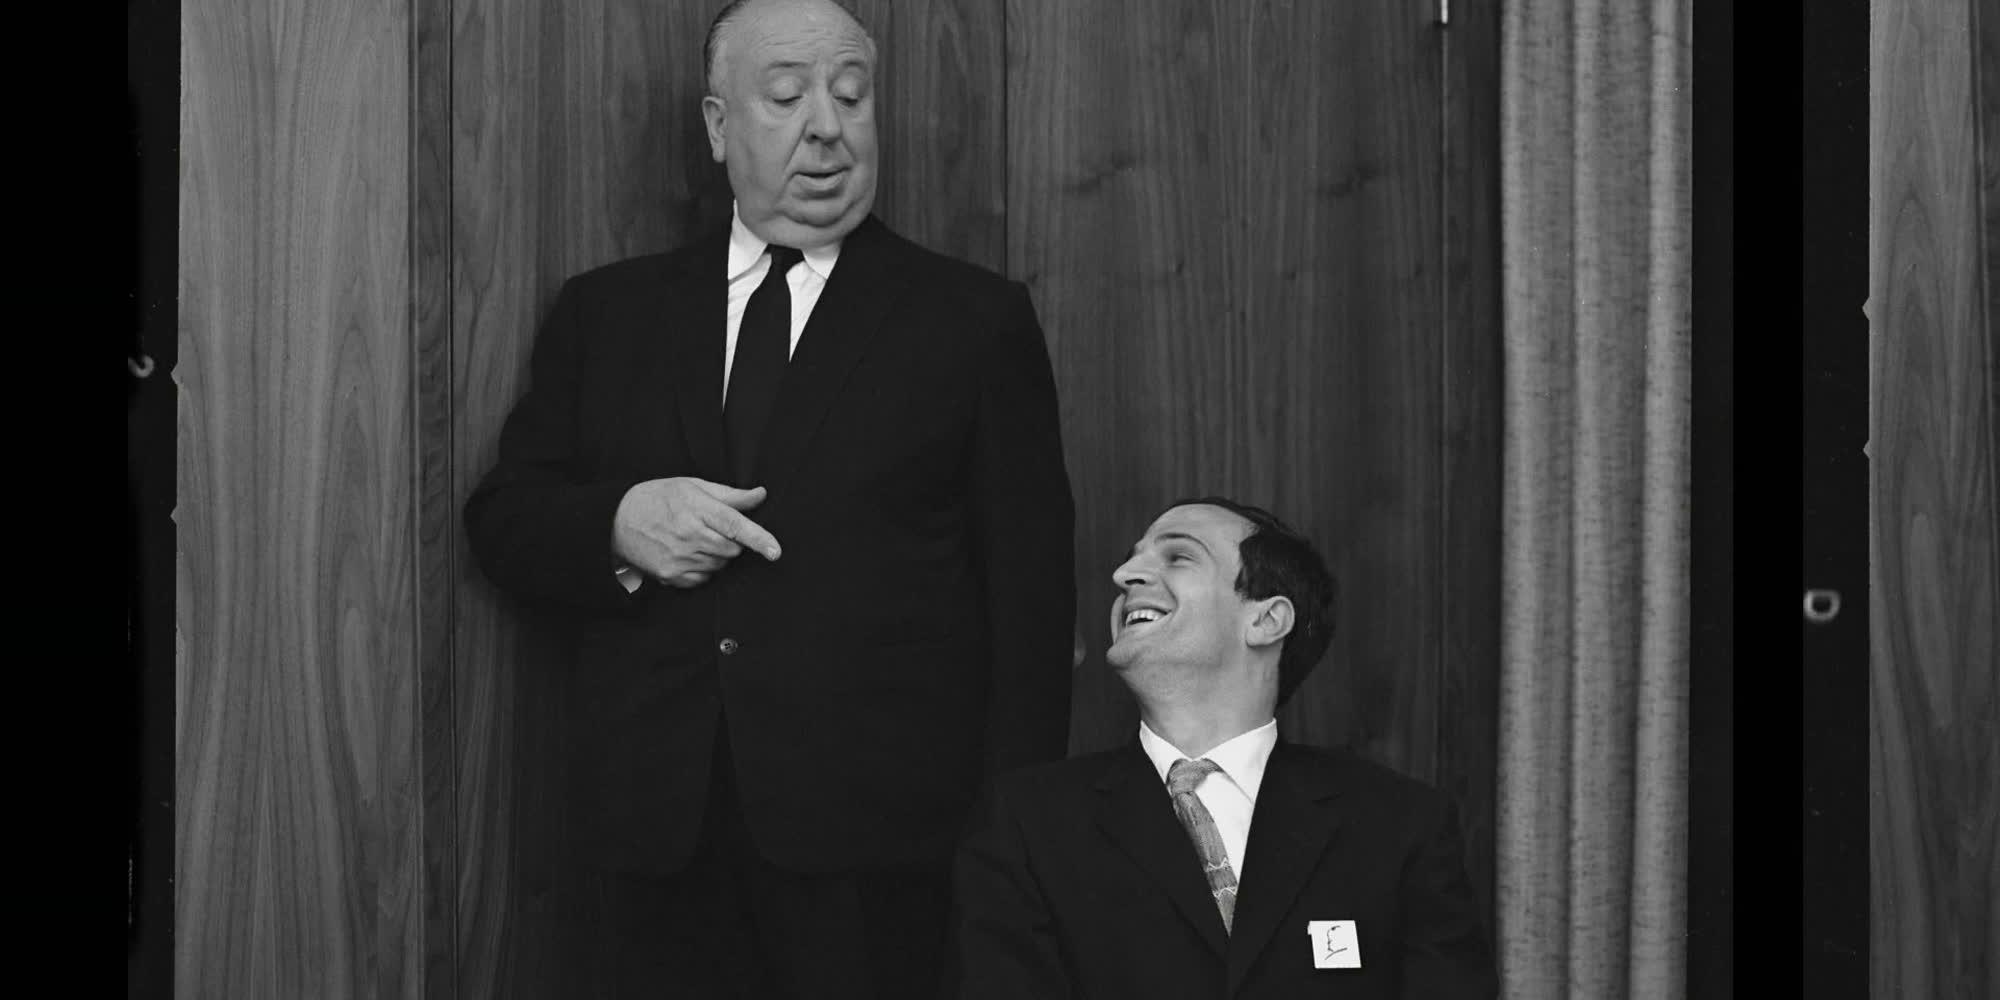 Utsnitt fra filmen Hitchcock / Truffaut.